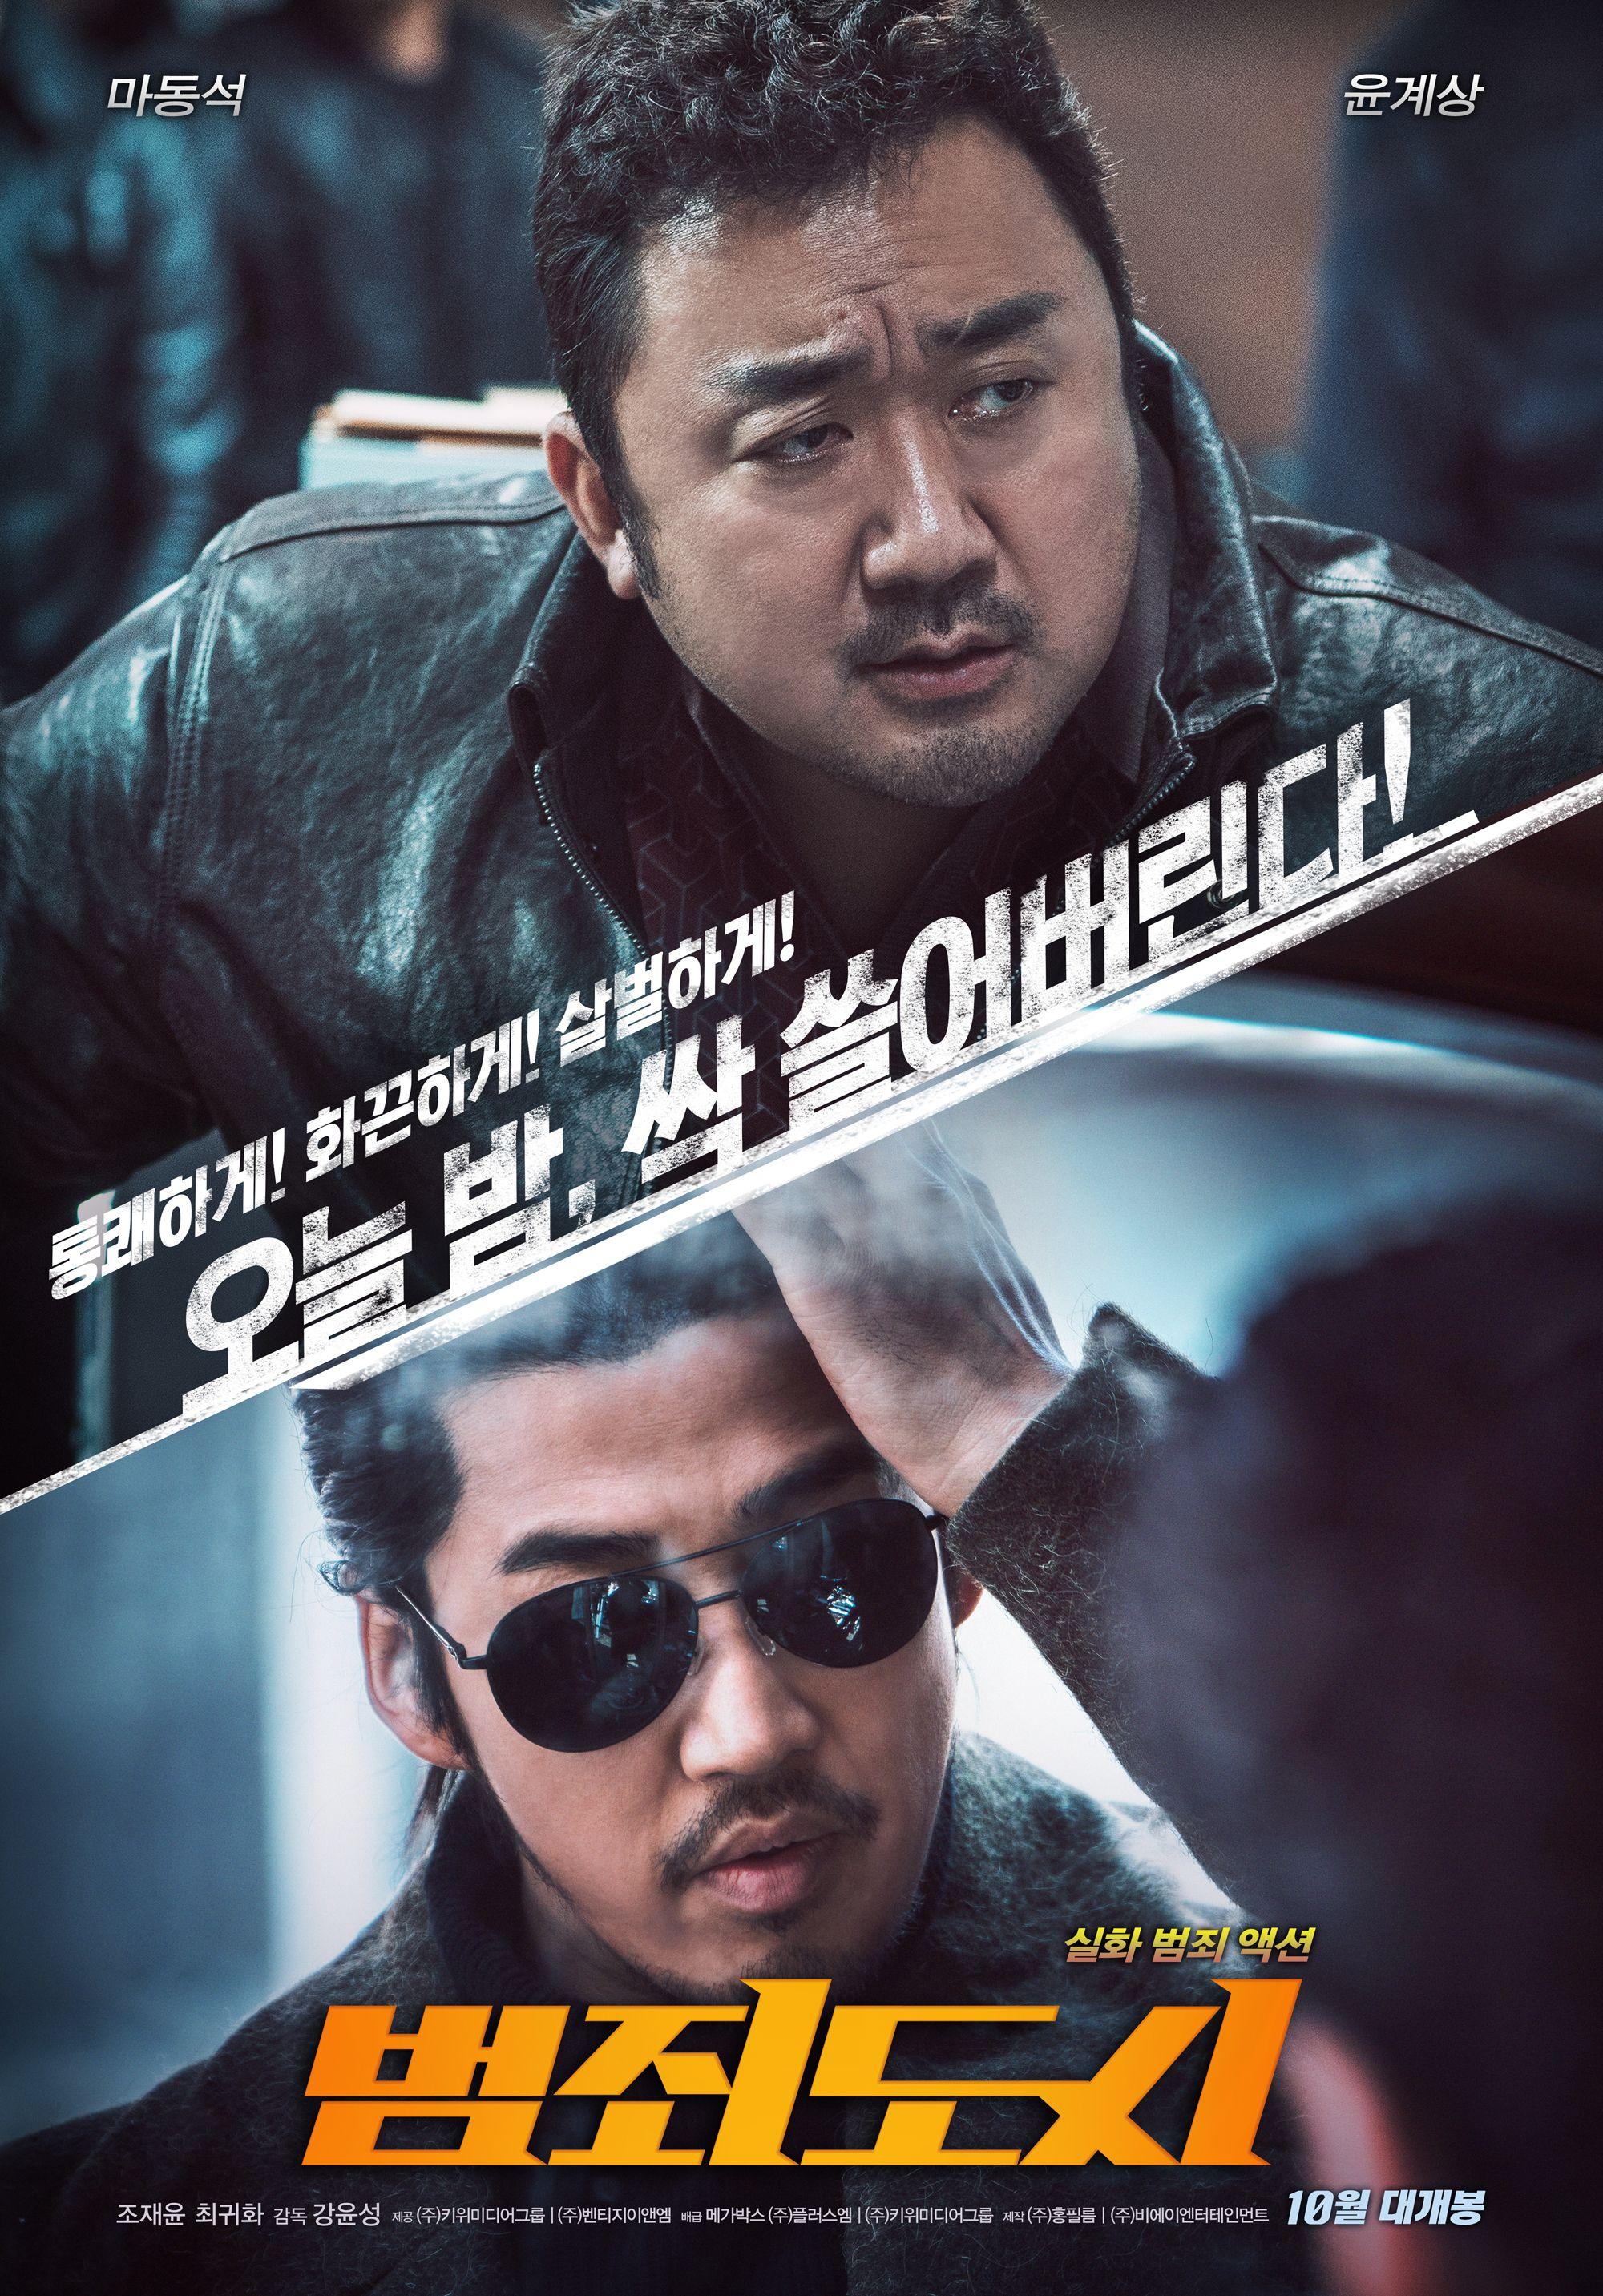 Sukku Son Cast as Villain in 'The Outlaws 2' en 2020